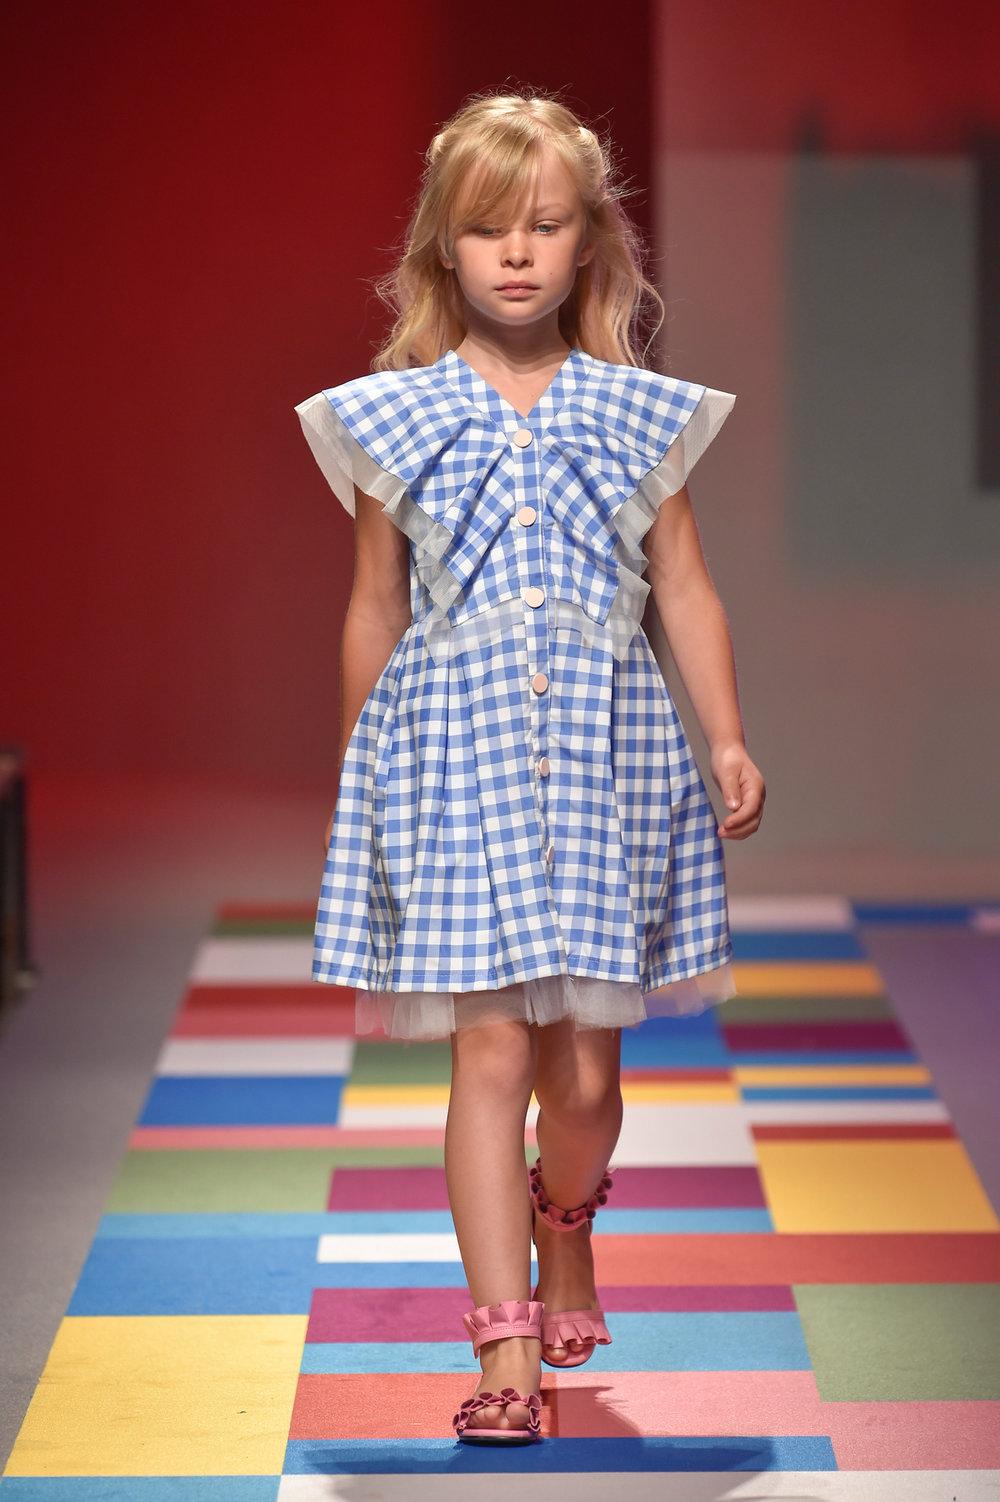 Copy of Paige Dress.JPG